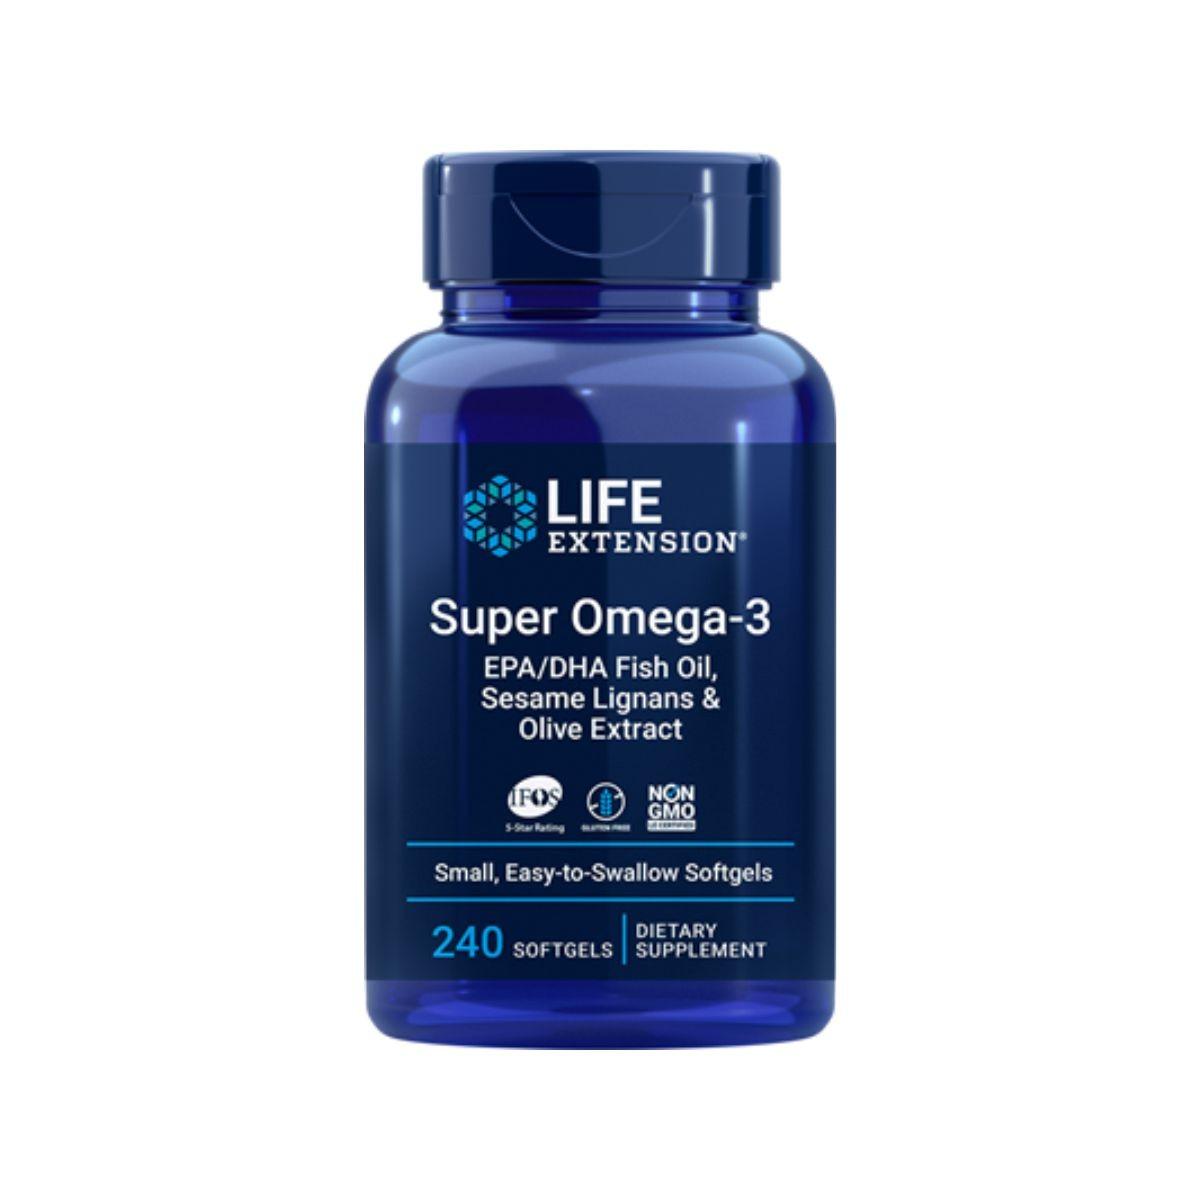 Super Omega EPA/DHA 240 Caps - Life Extension